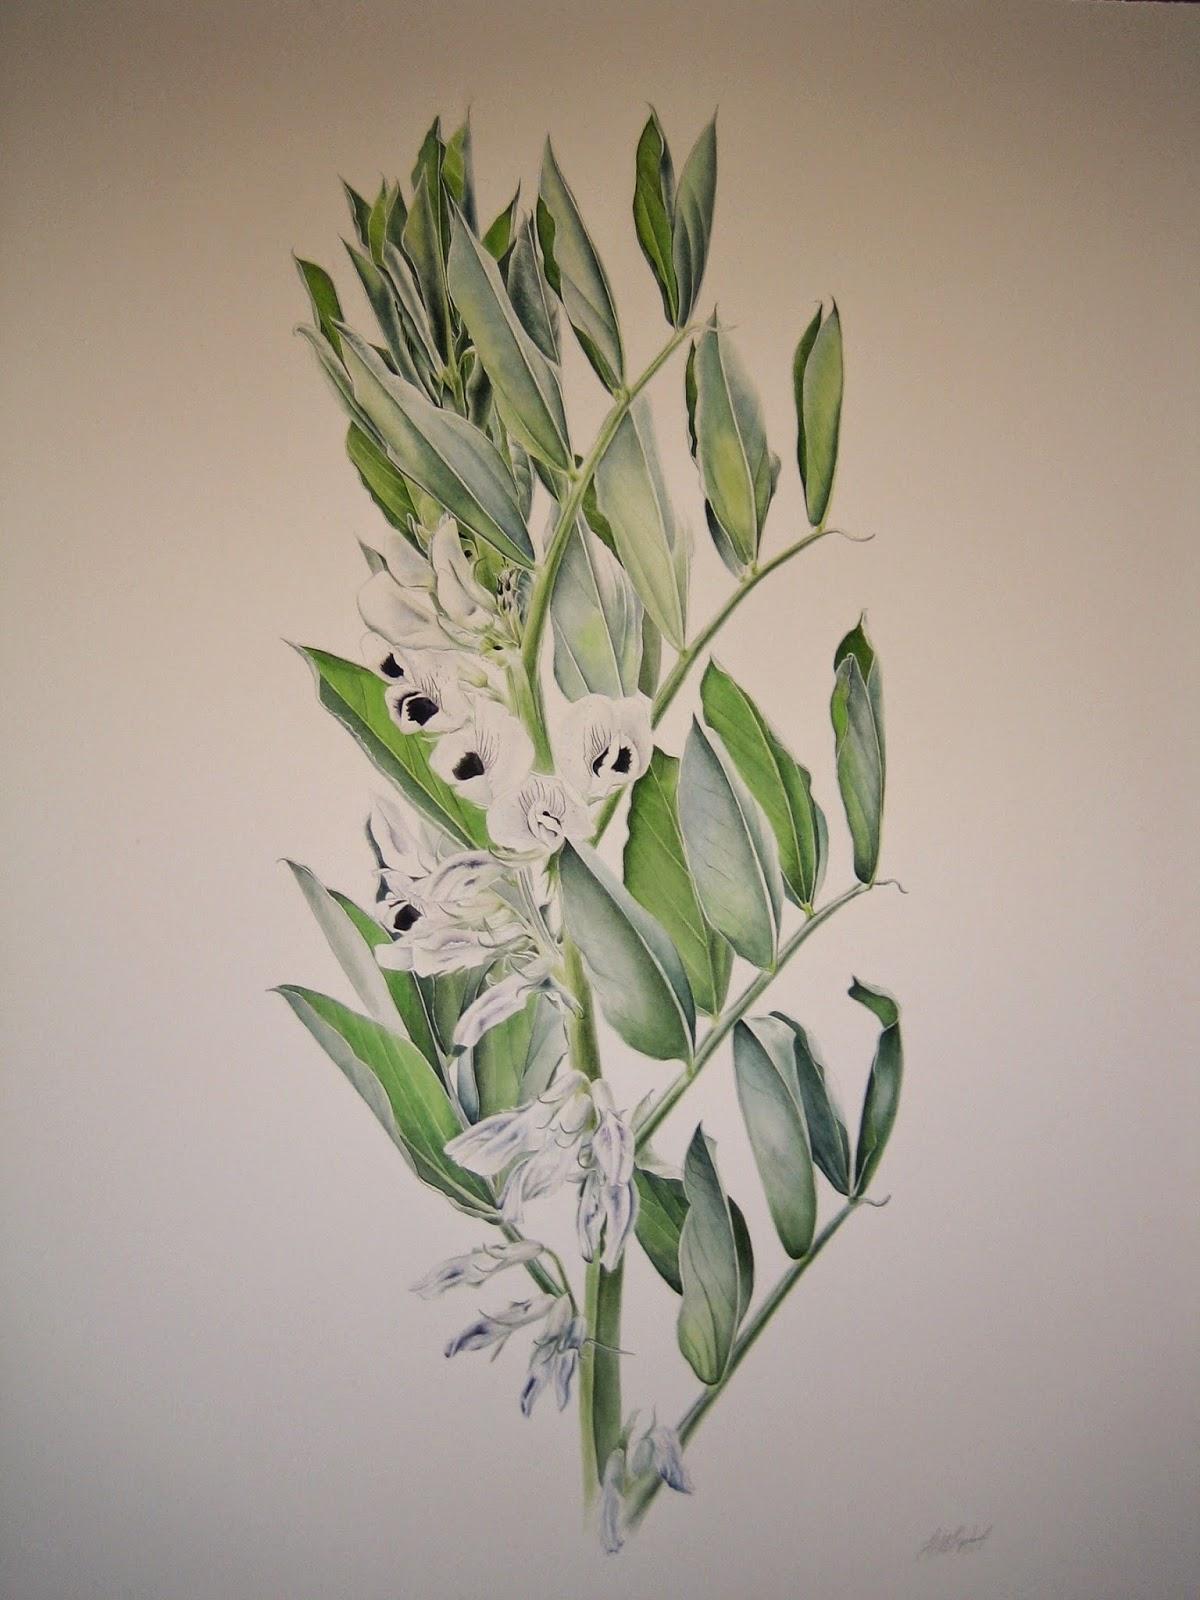 Broad Bean - Vicia faba